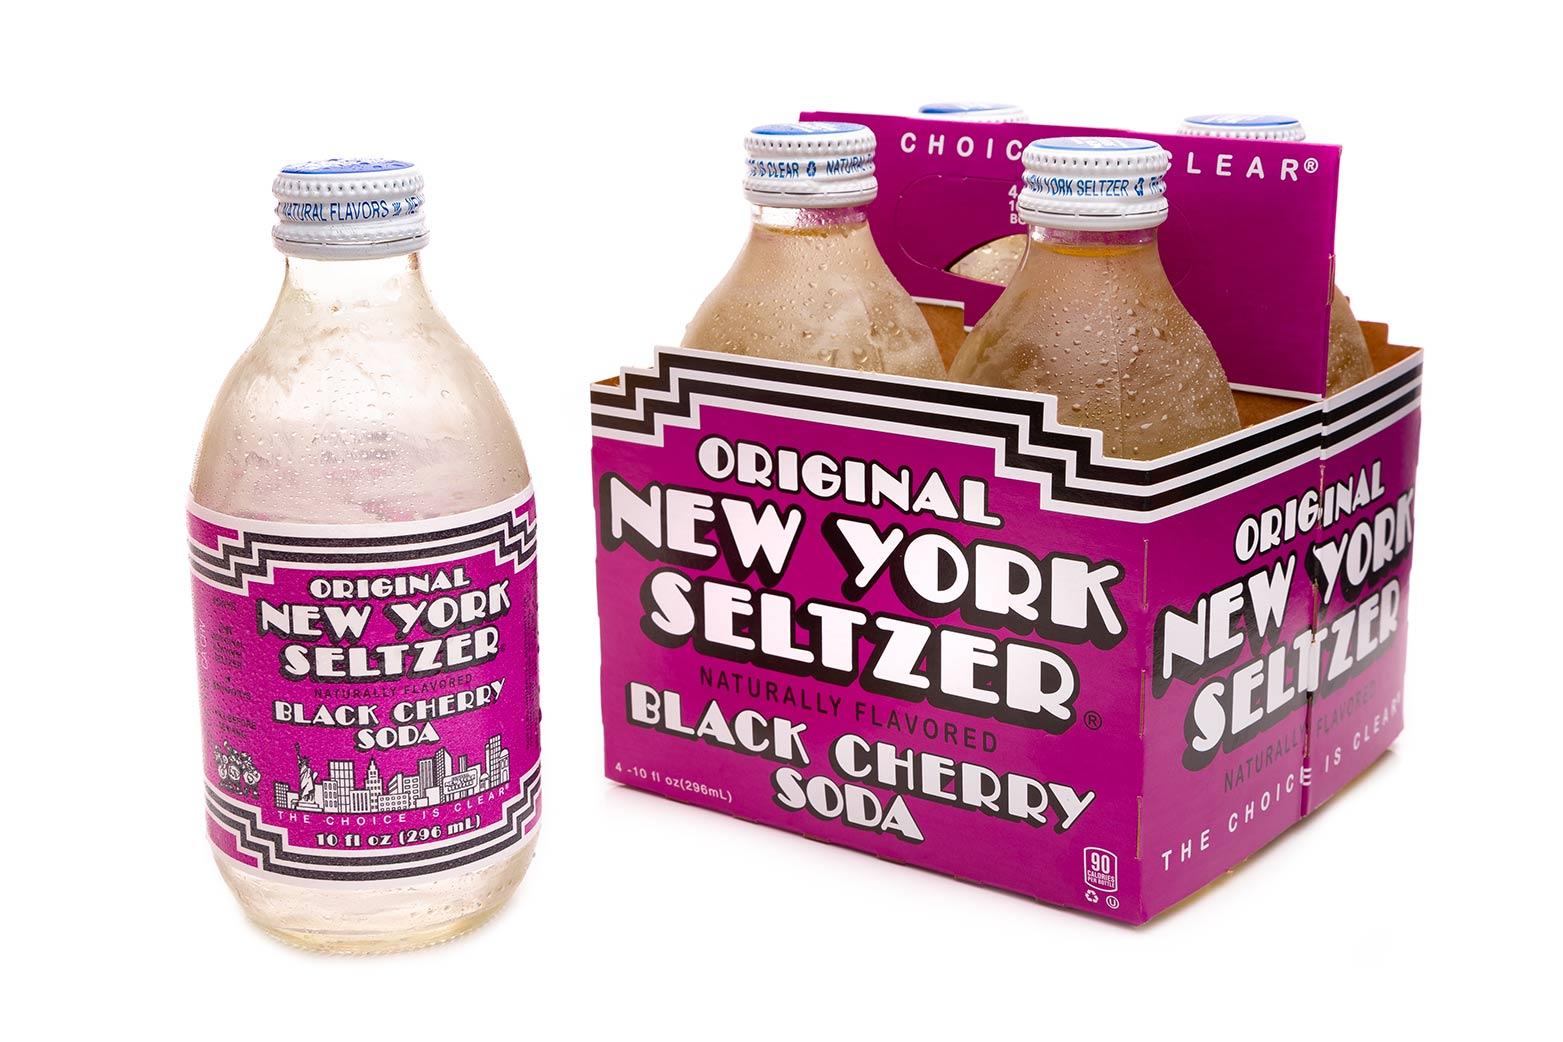 Original New York Seltzer Black Cherry 4-pack carrier with bottle